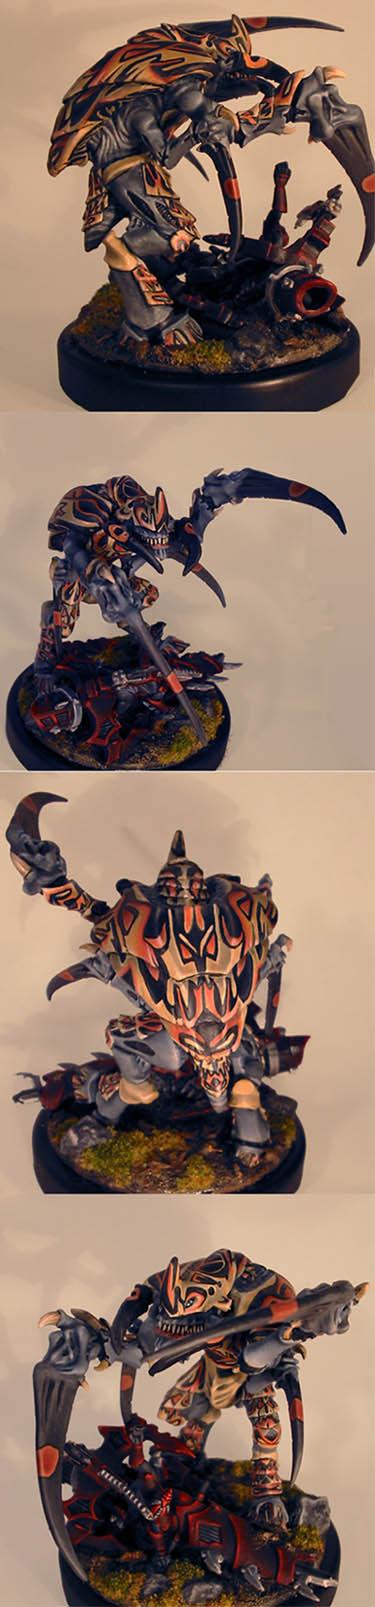 Carnifex (Silver Demon)